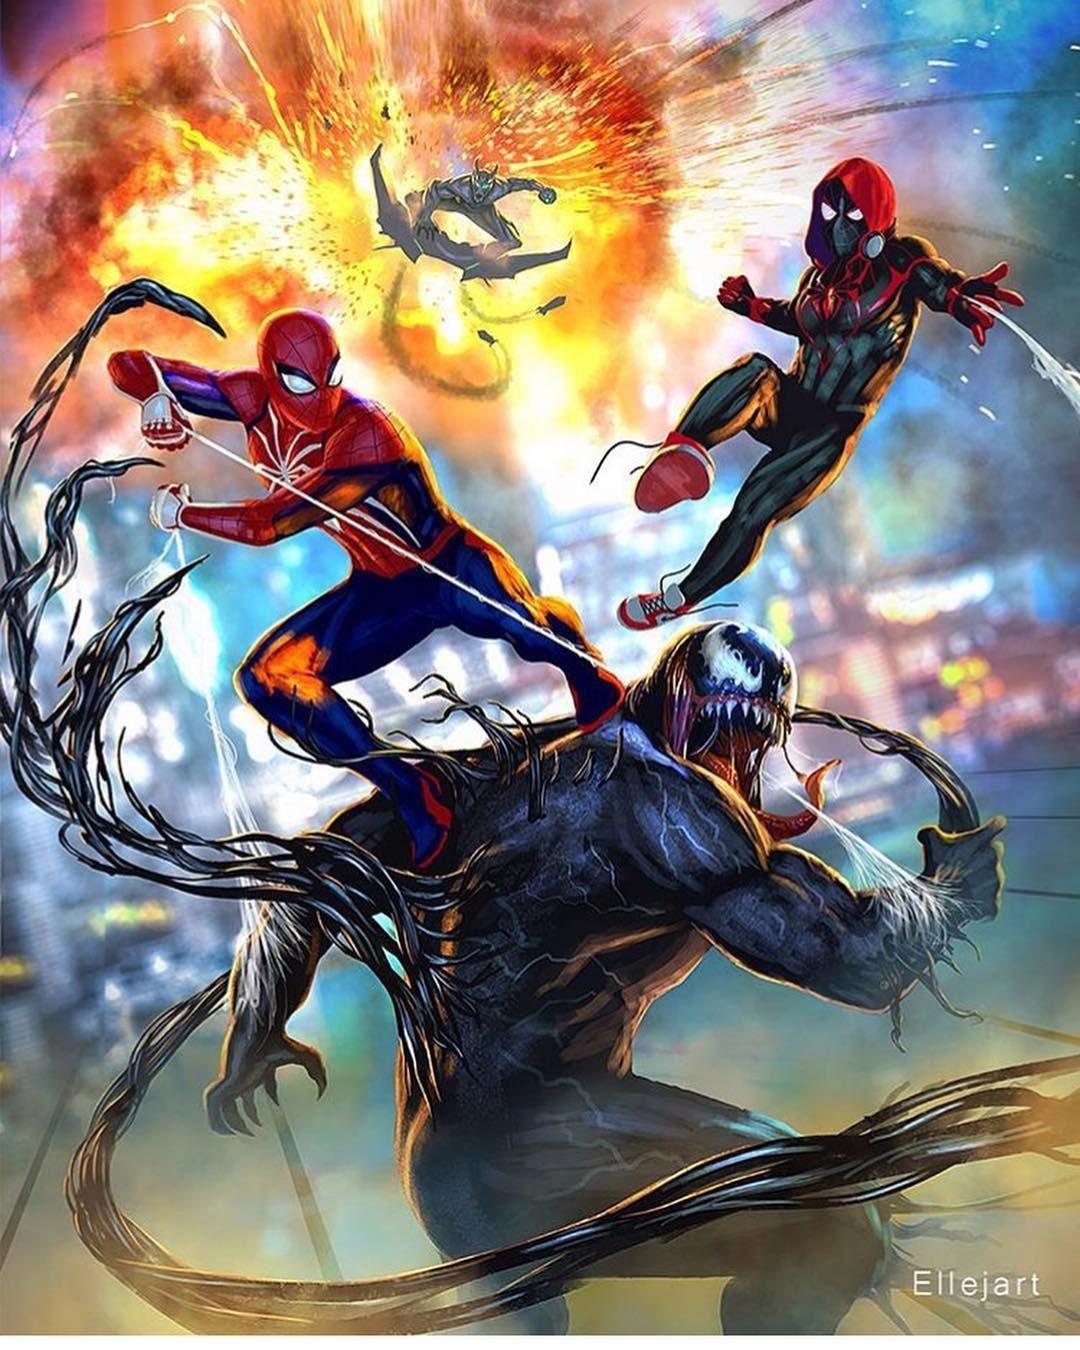 "07726d38 Gym Heroics Apparel on Instagram: ""2 on 2 Artist @ellejart WWW.GYMHEROICS.COM  #bodybuilding #riot #hoodies #ironman #avengers #dc #marvel #spiderman ..."